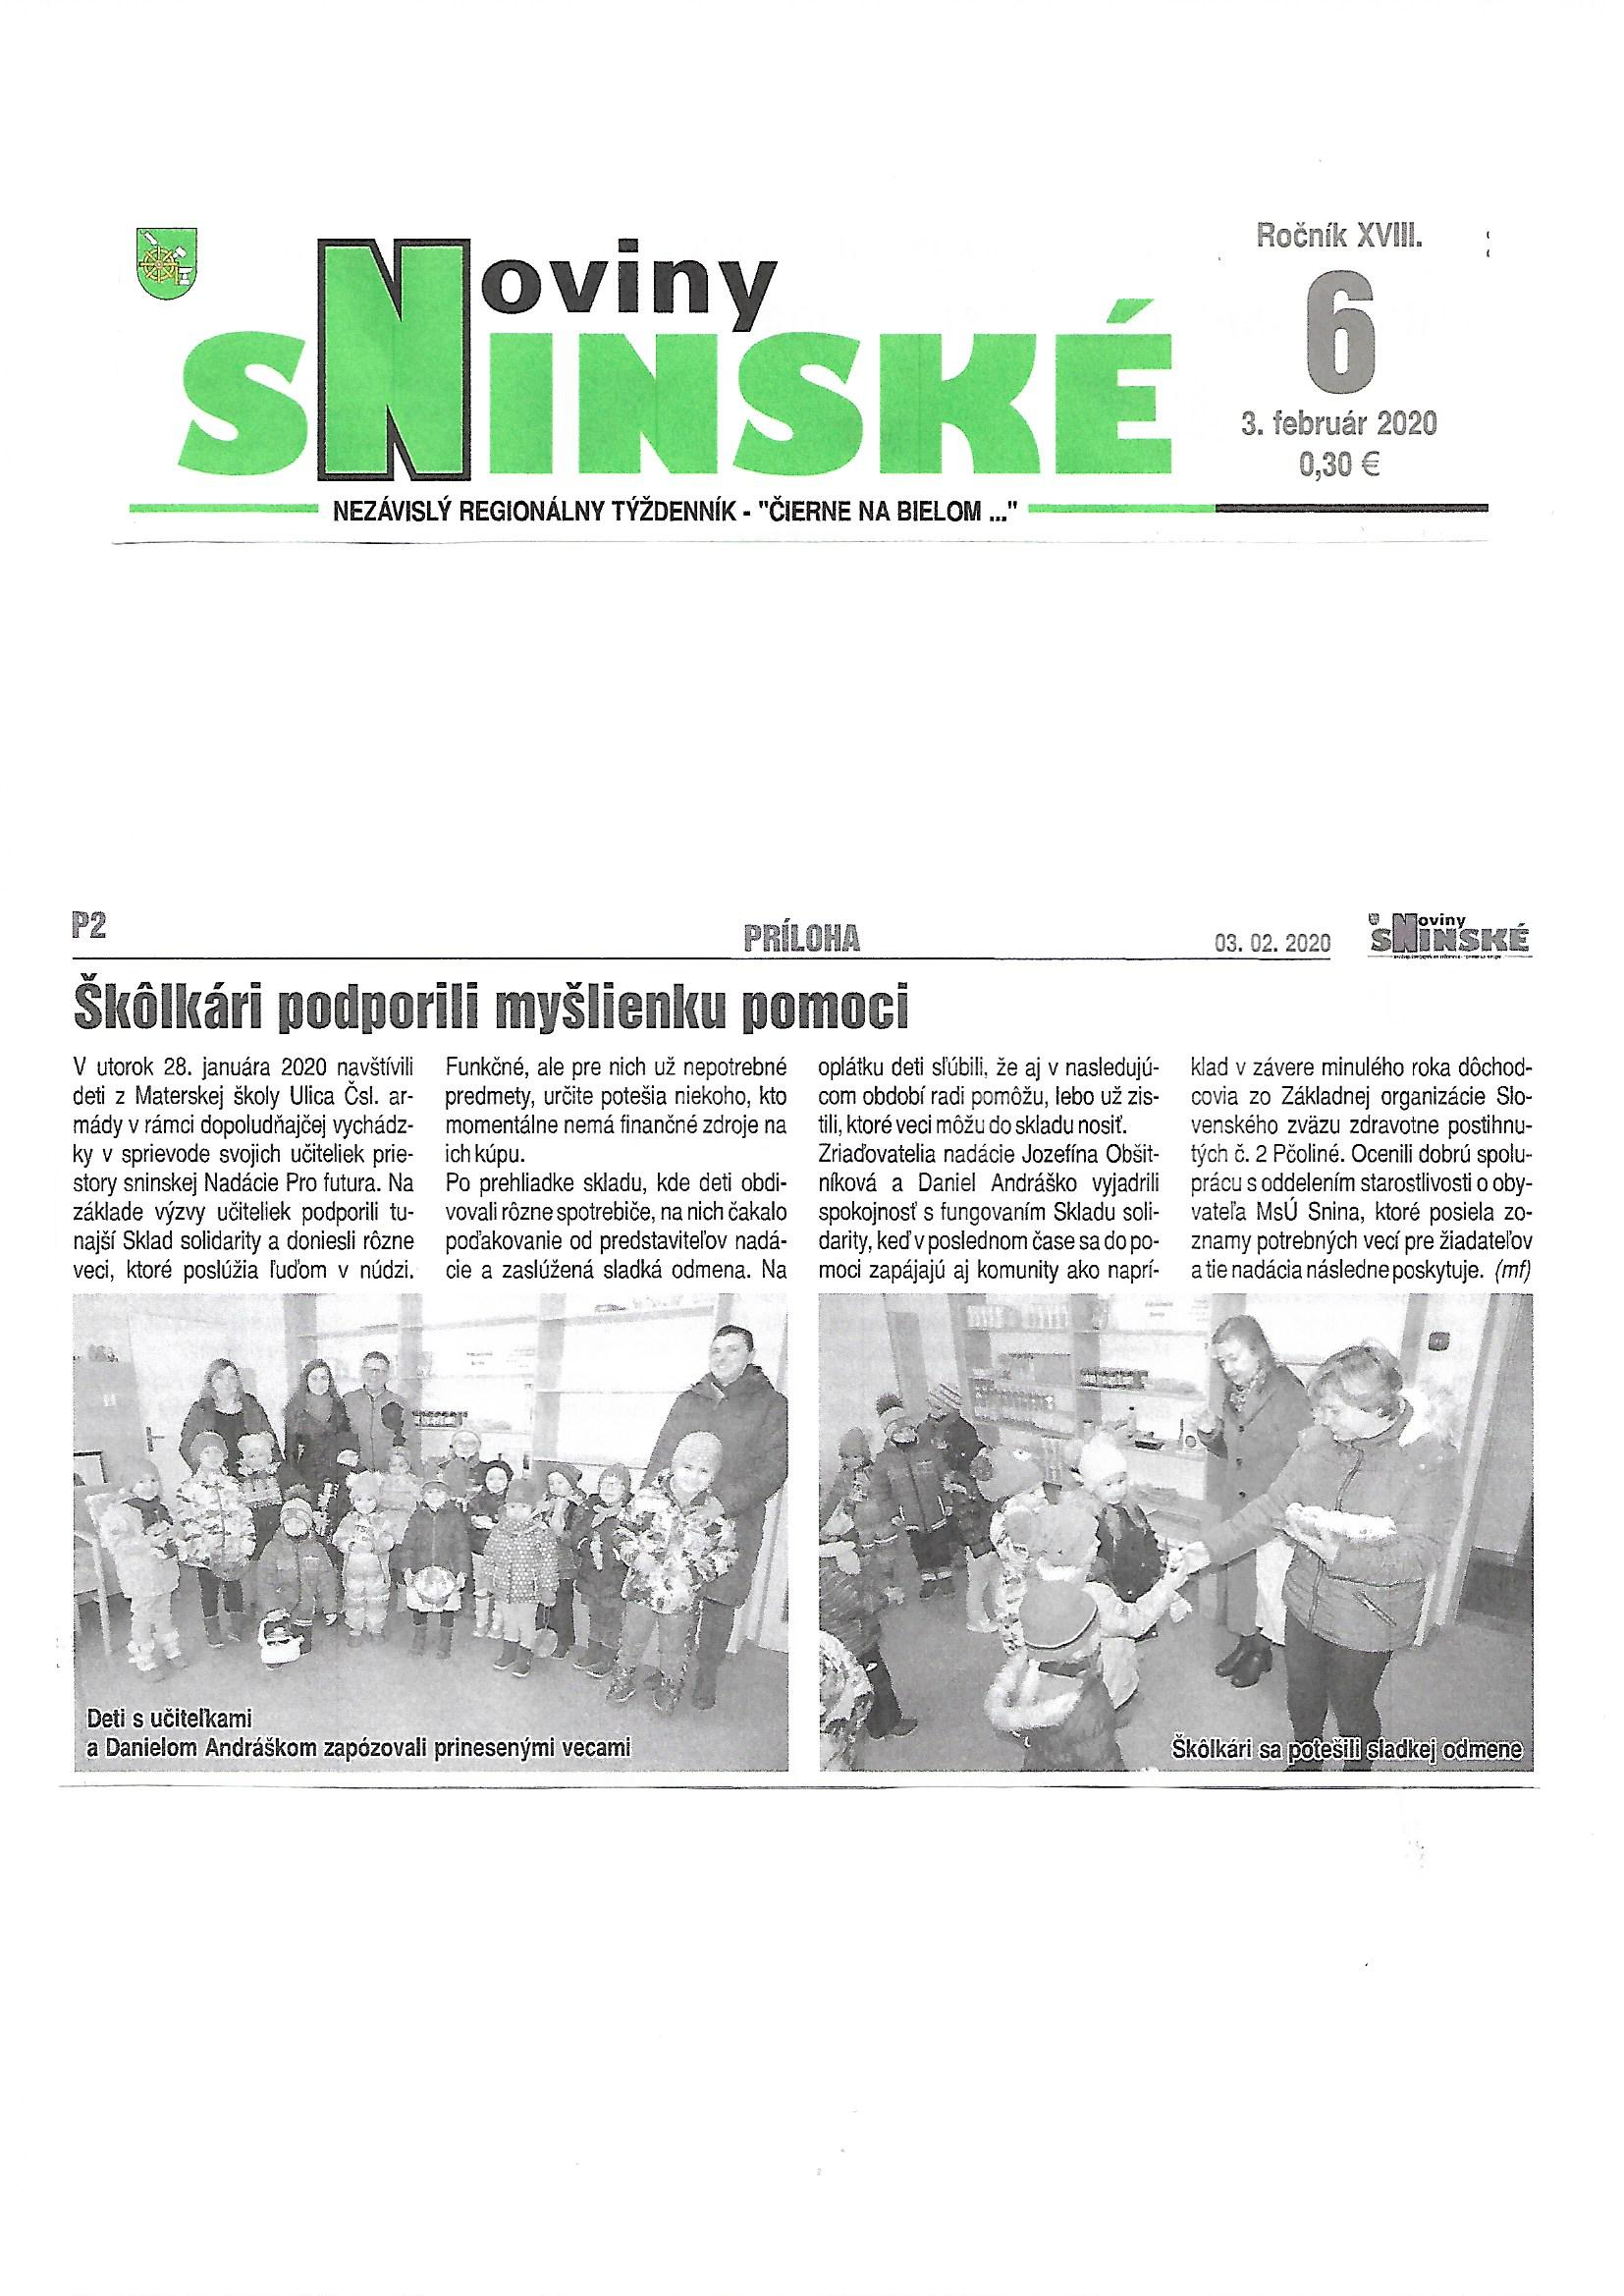 Škôlkari podporili Sklad solidarity